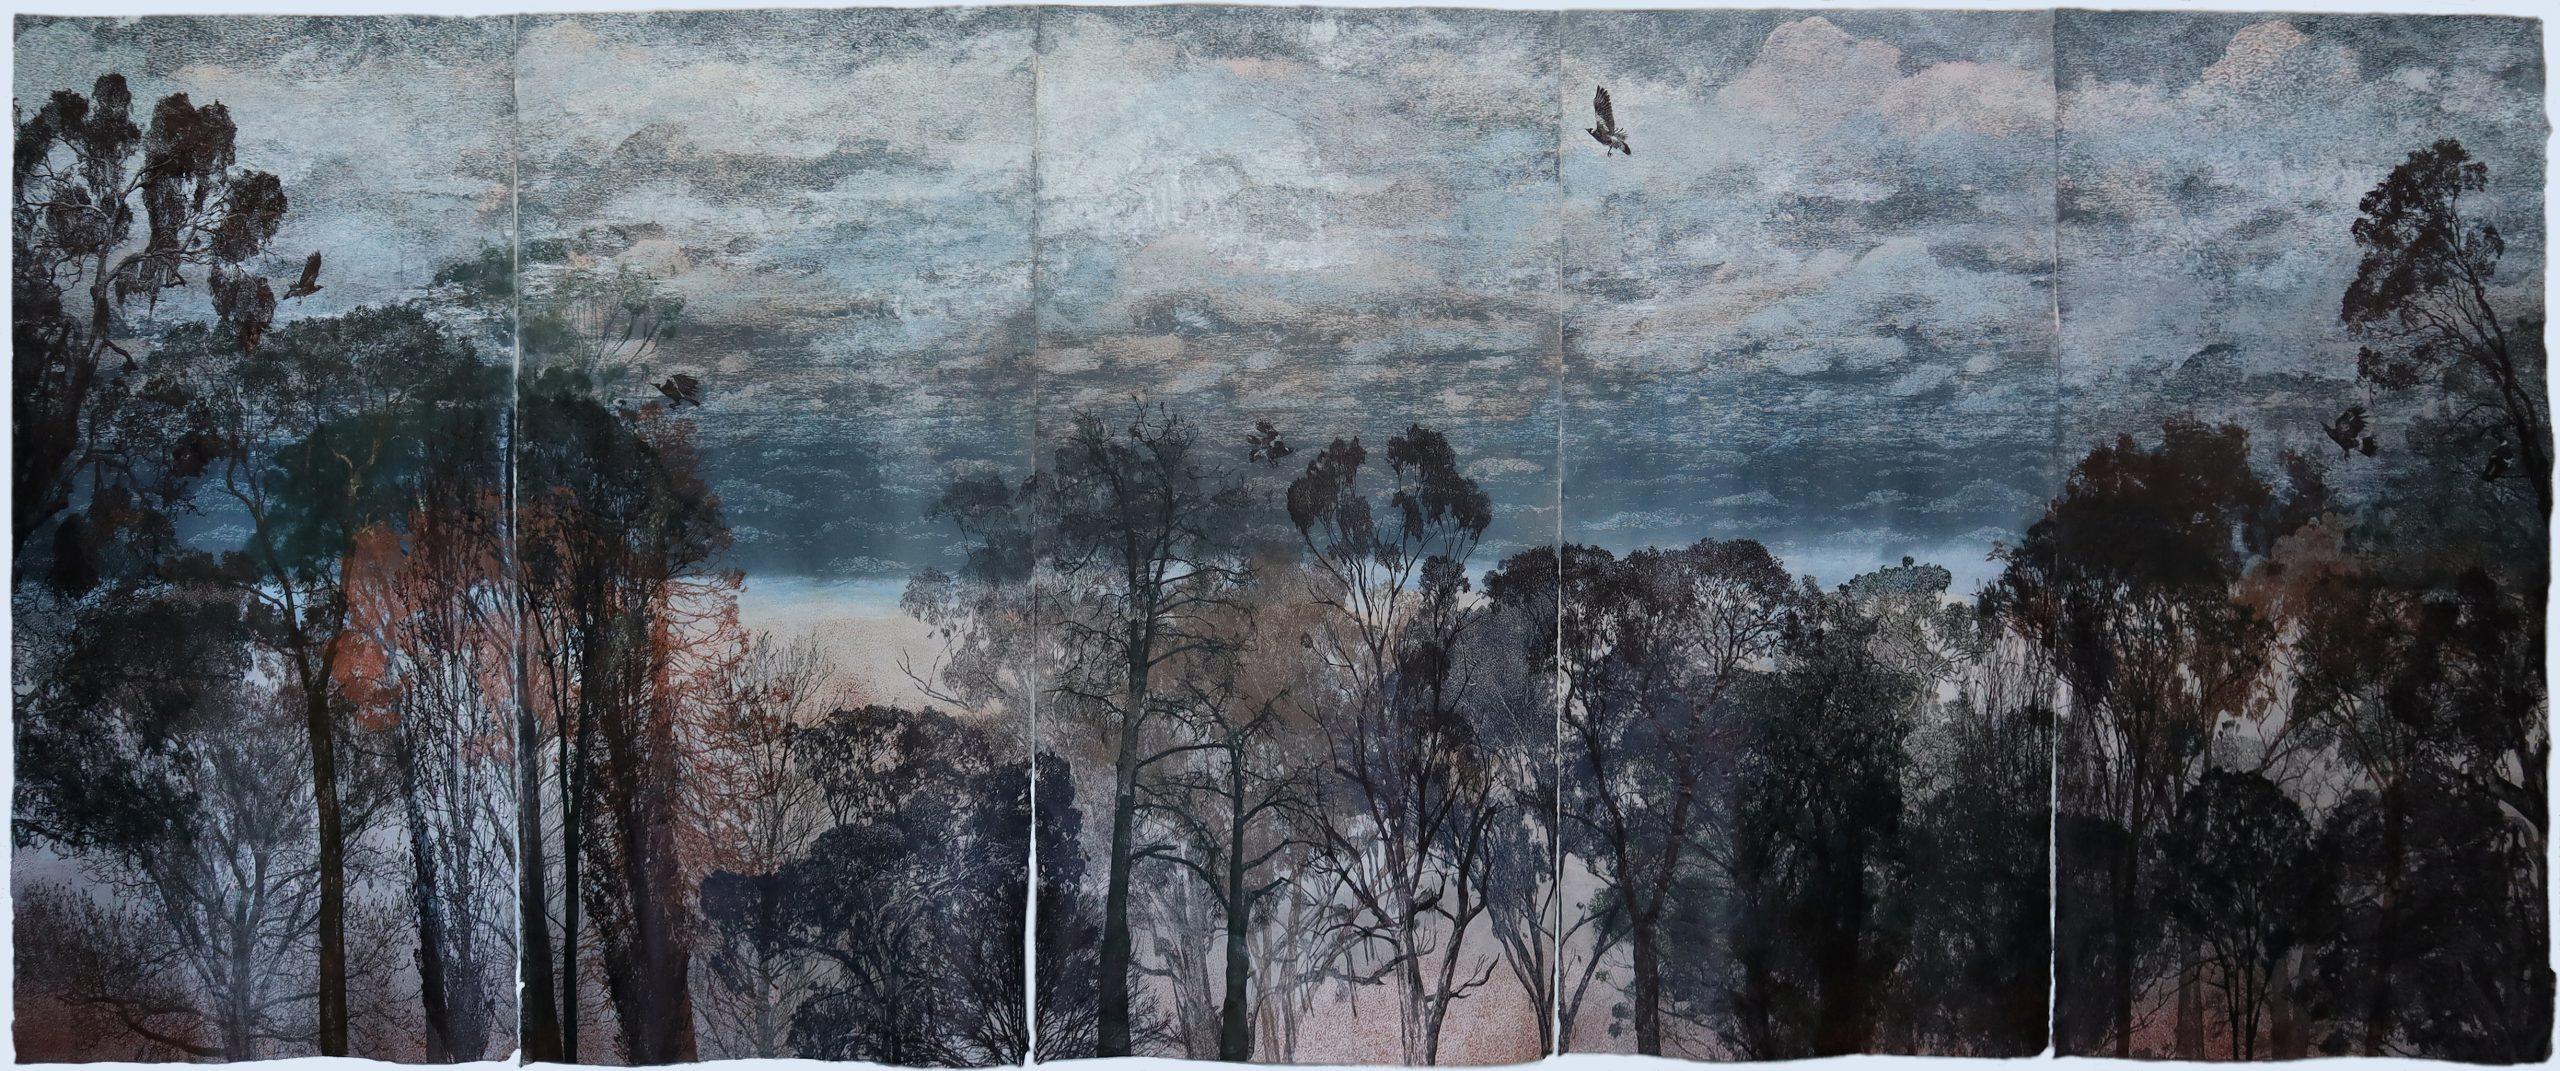 Dianne Fogwell – Winner of the 2021 Geelong Acquisitive Print Award